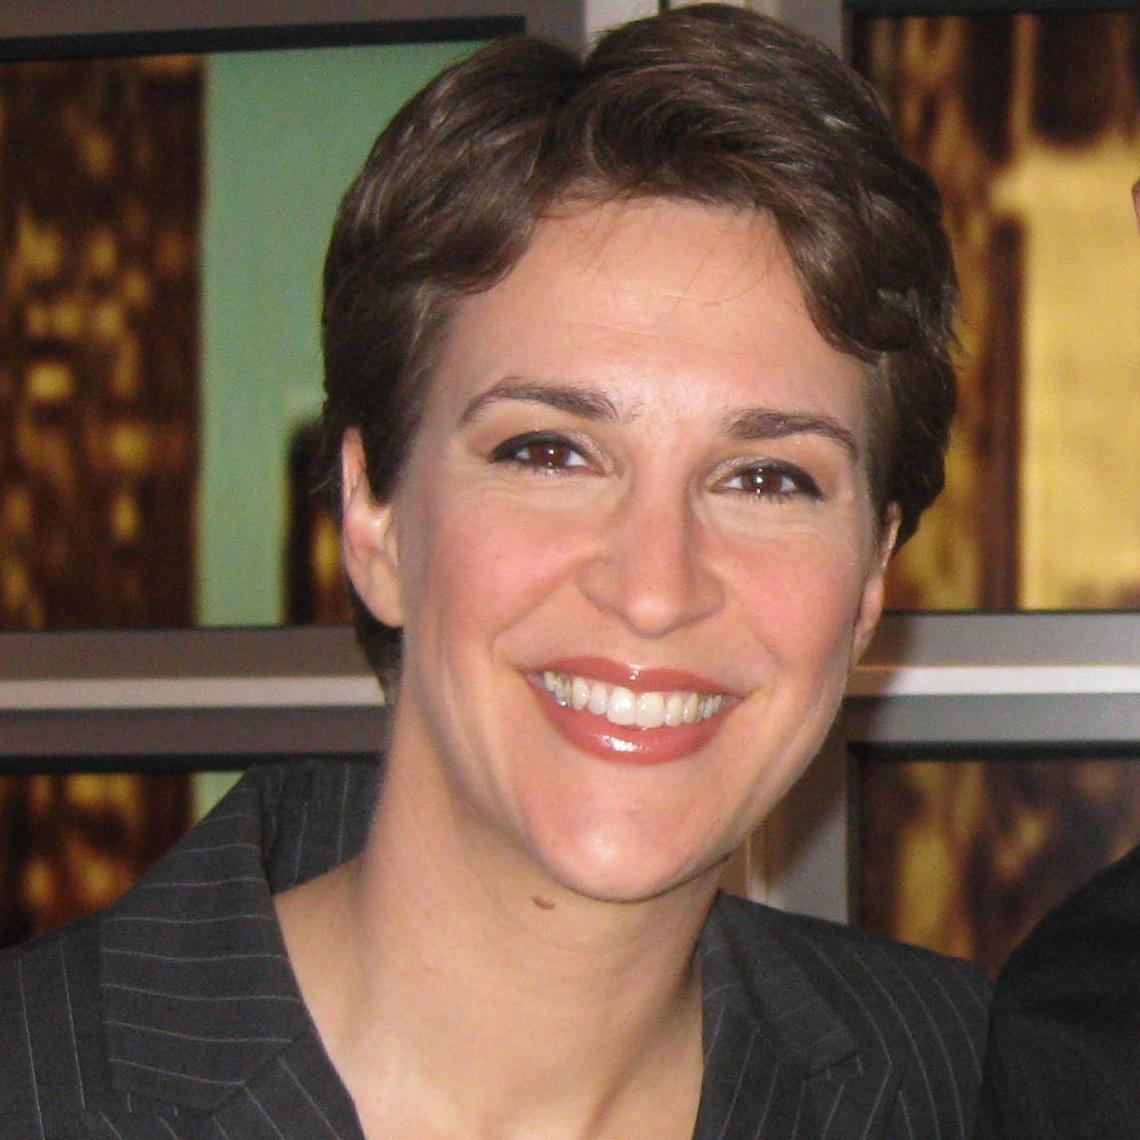 Rachel Maddow Bio, Net Worth, Facts